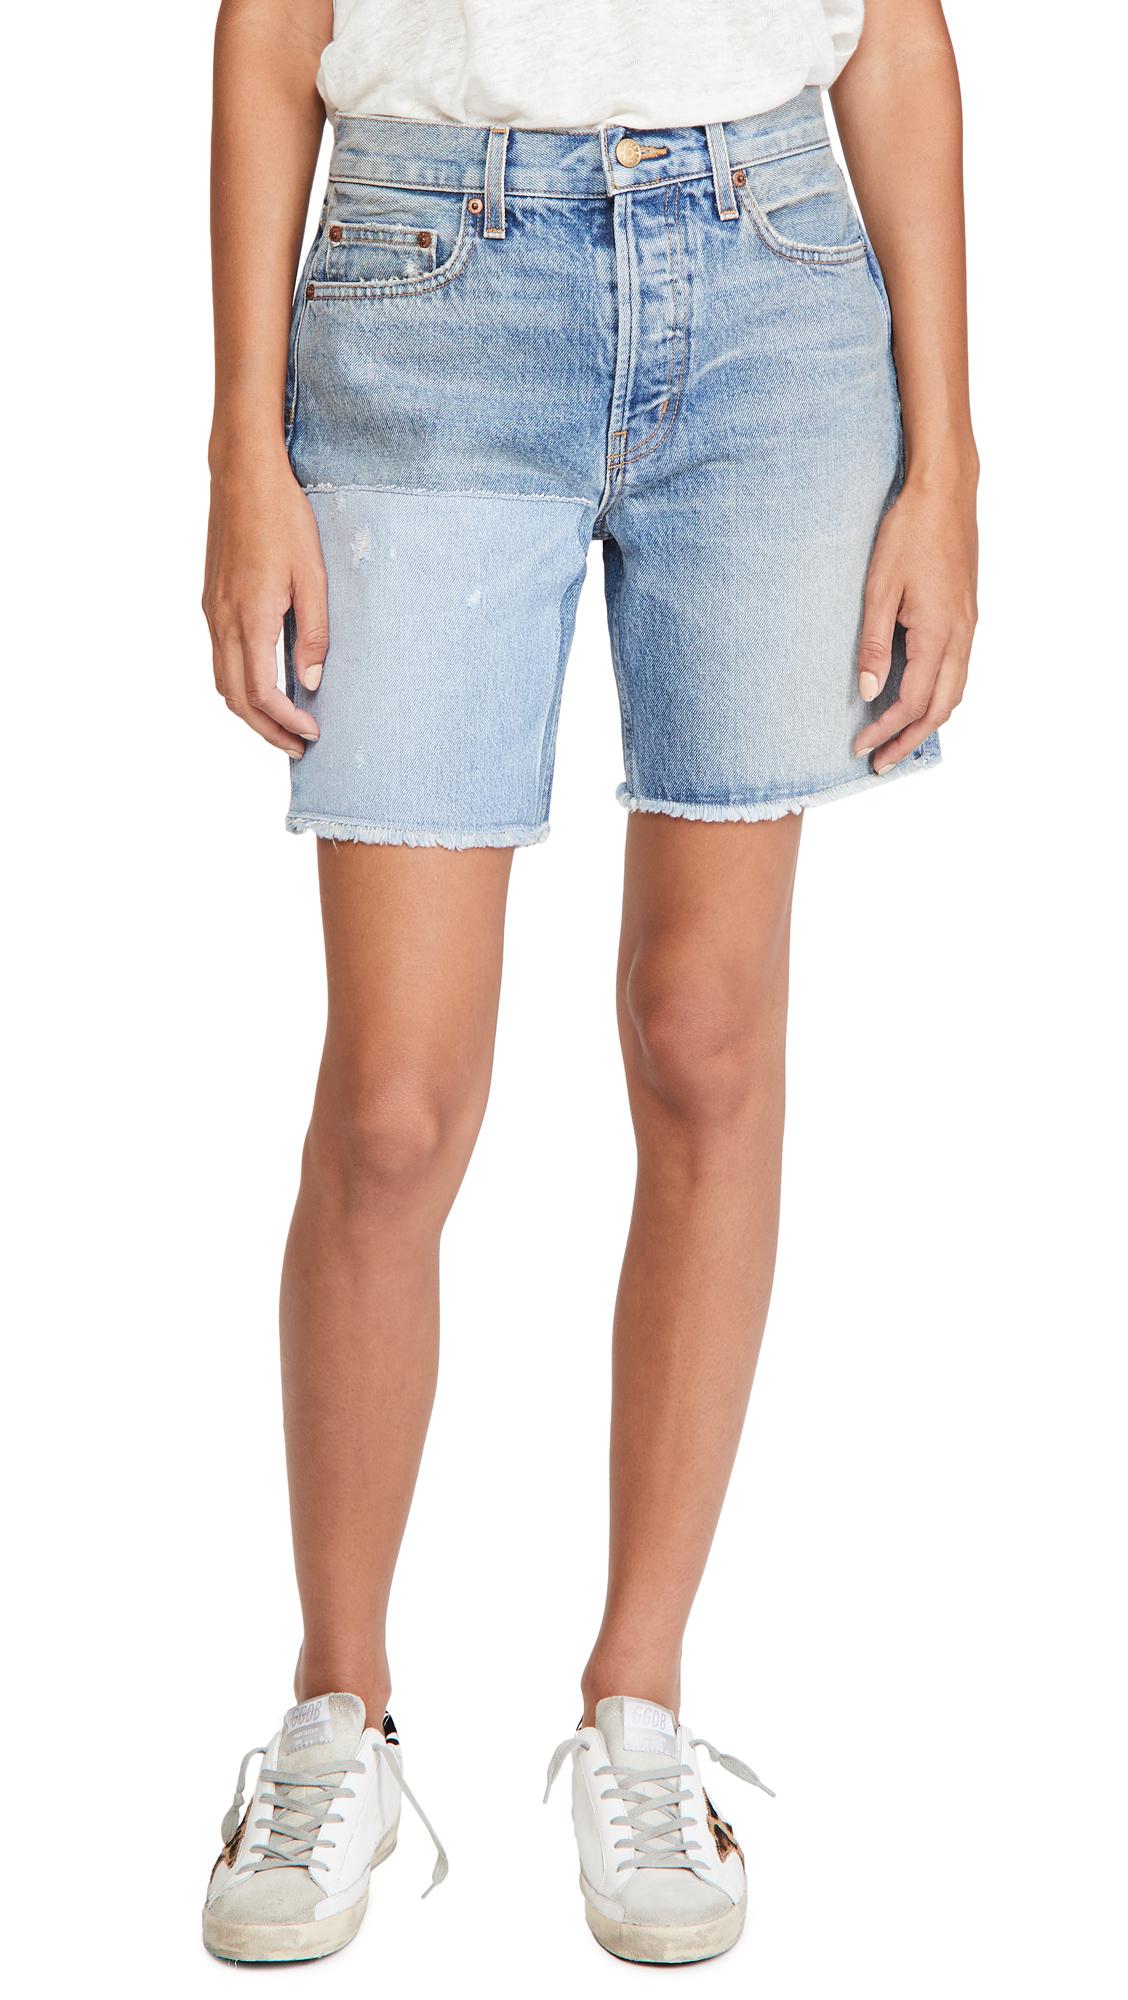 B Sides Cut Off Shorts